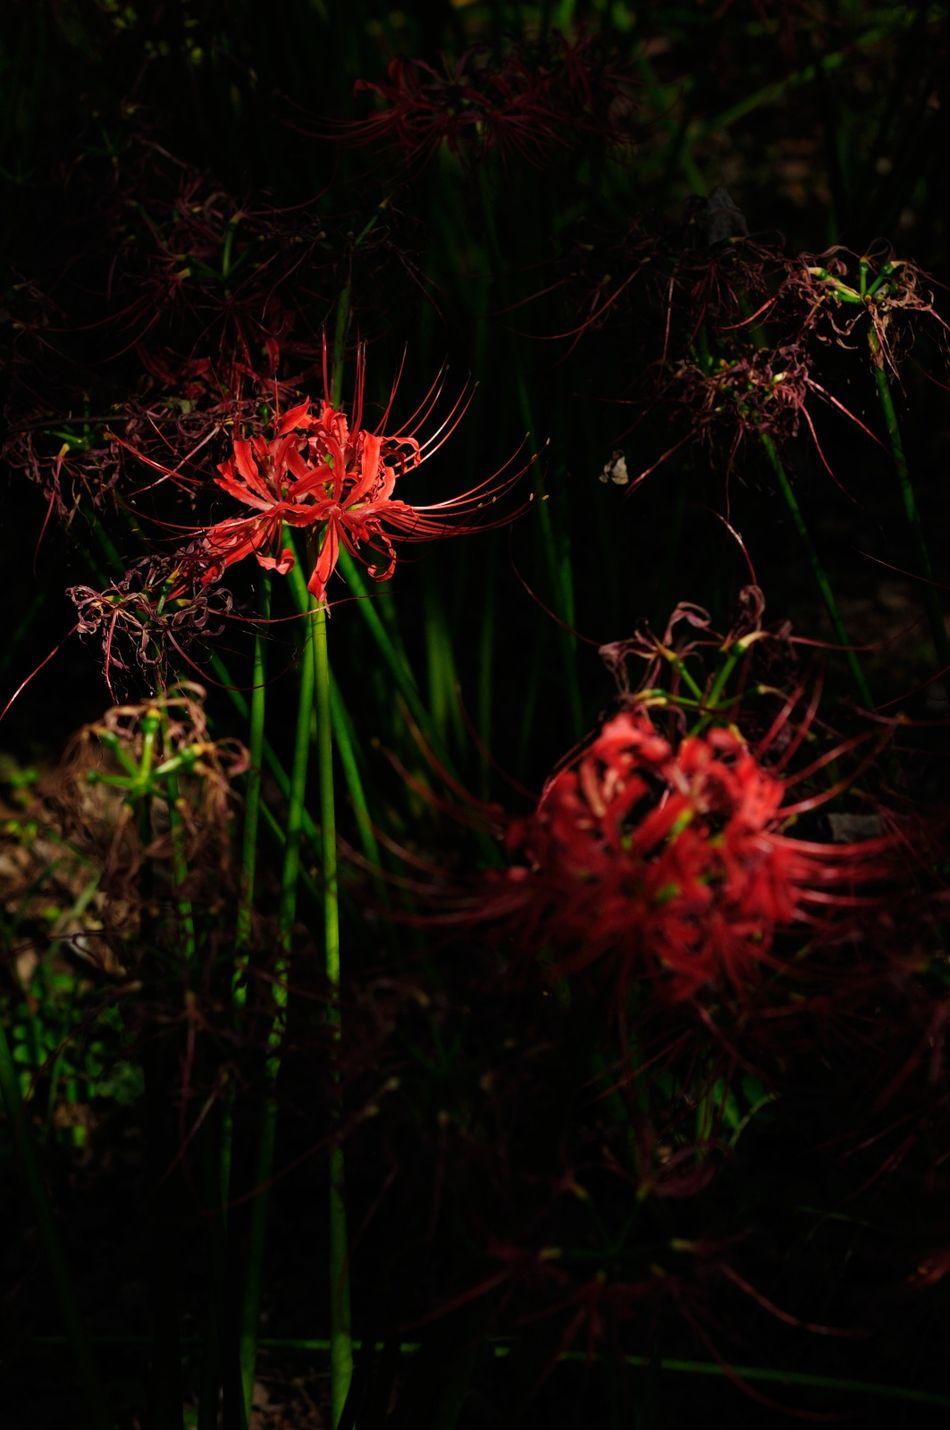 Redspiderlily Cluster Amaryllis Spotlight Stage 曼珠沙華 彼岸花 スポットライト 名脇役